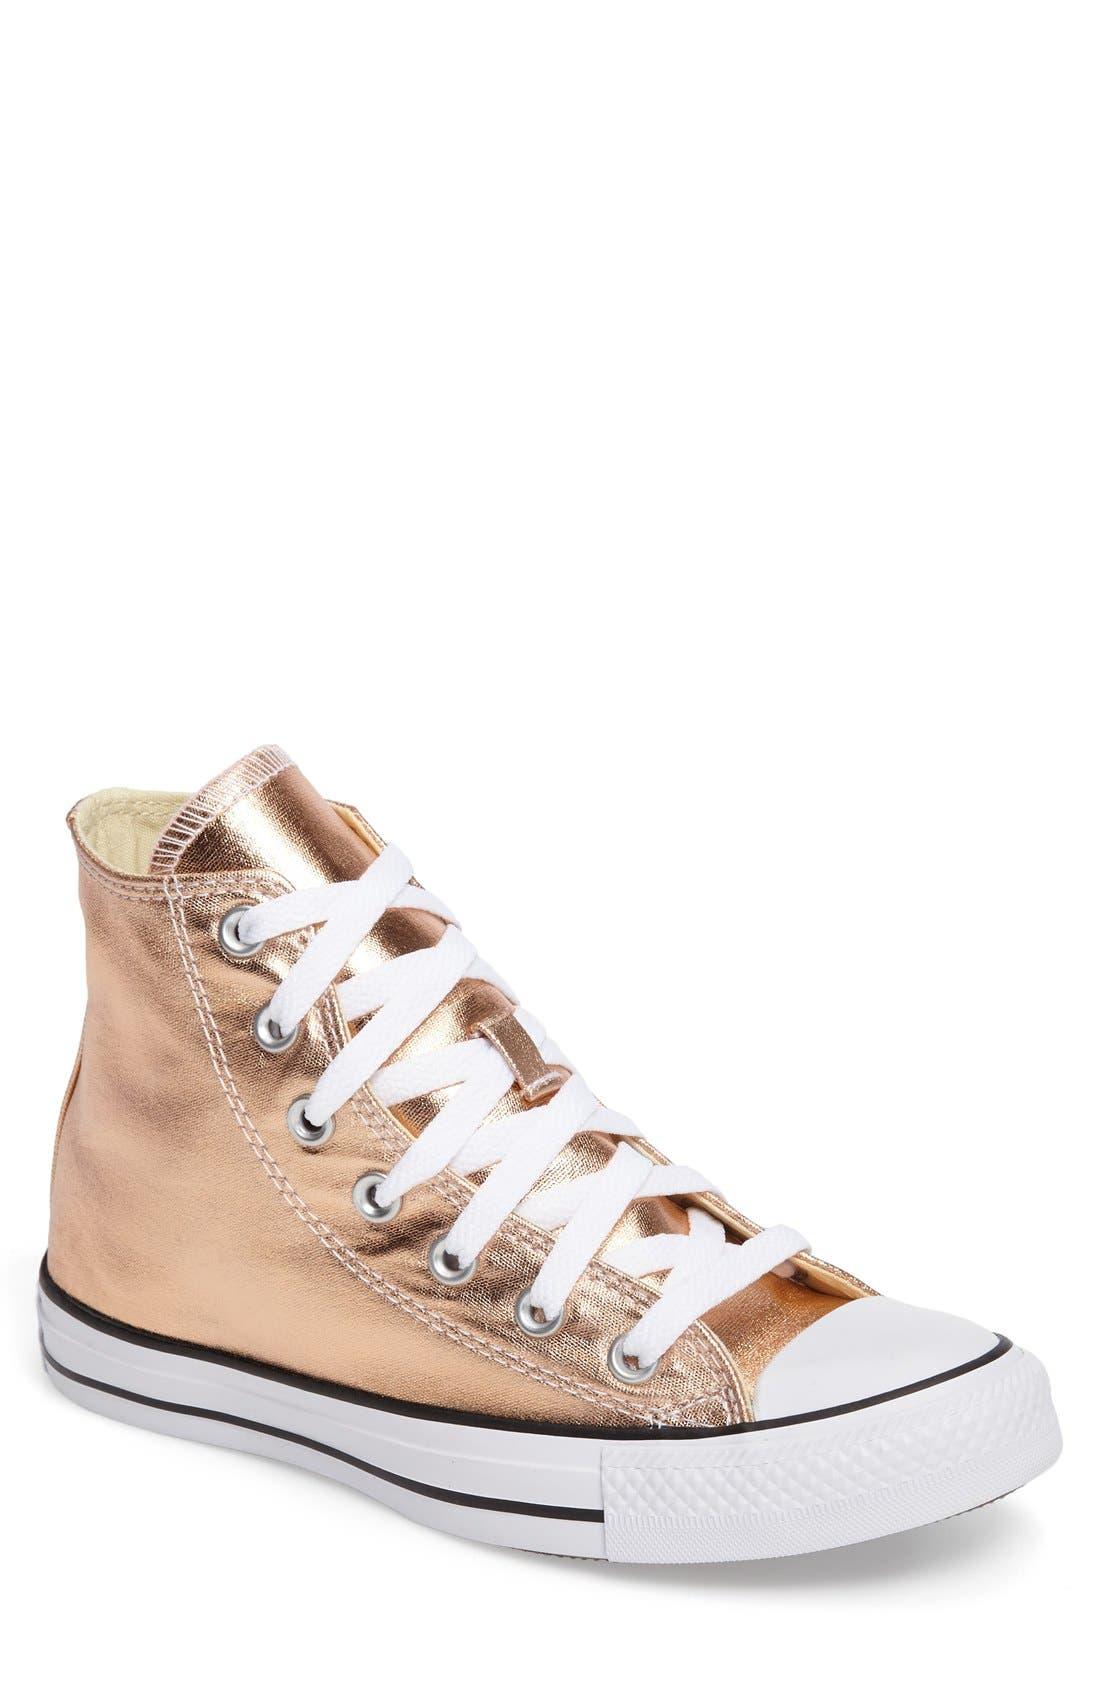 Alternate Image 1 Selected - Converse Chuck Taylor® All Star® Metallic High Top Sneaker (Women)